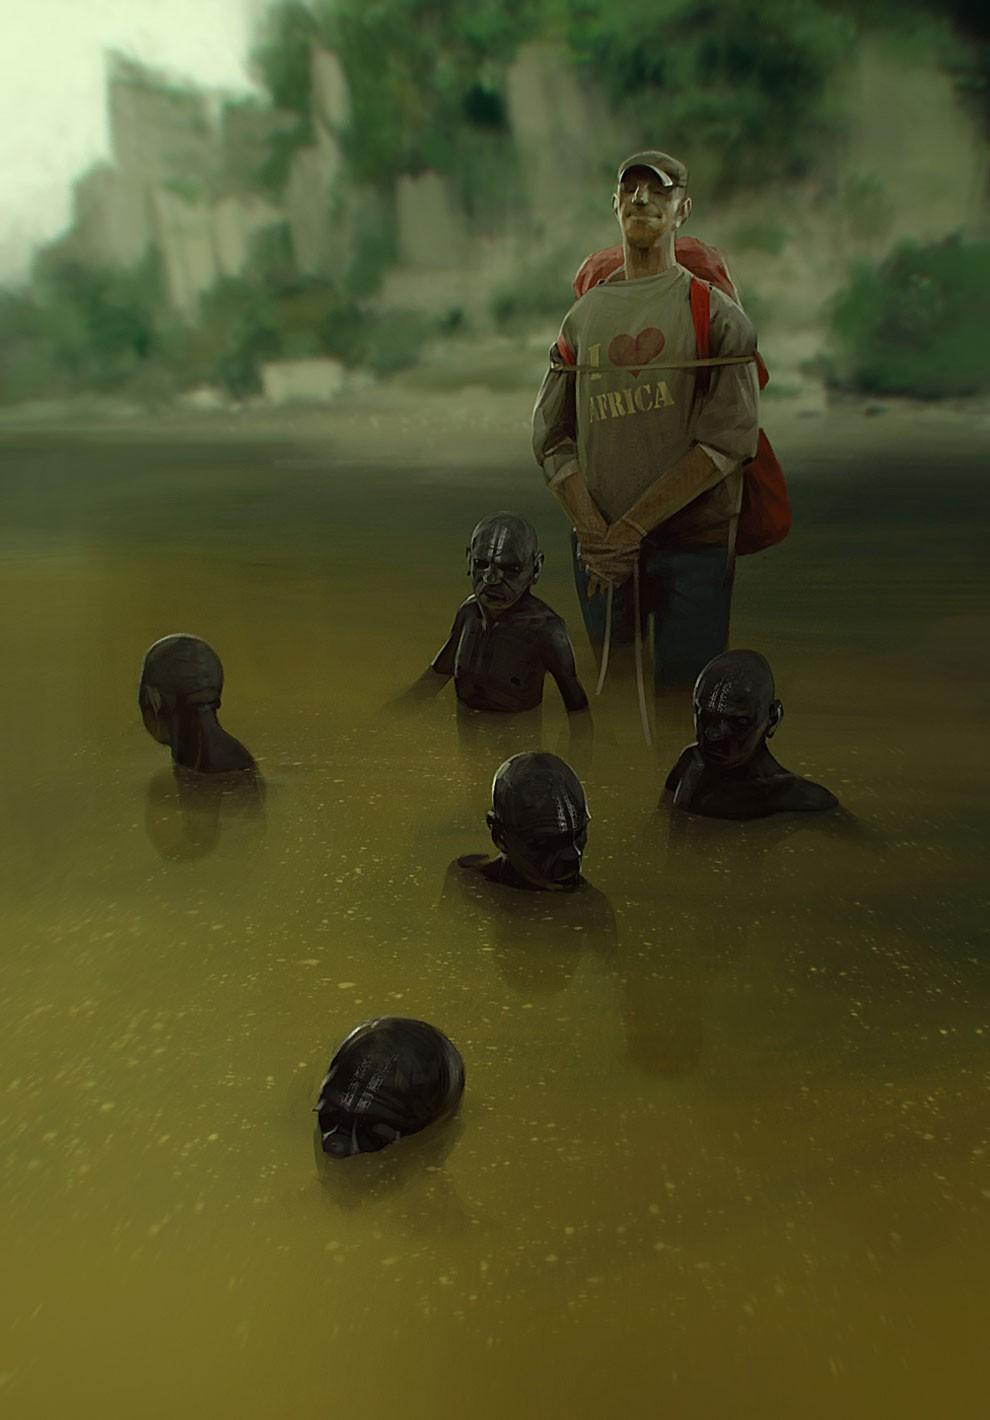 dipinti-digitali-horror-fantasy-sergey-kolesov-peleng-39